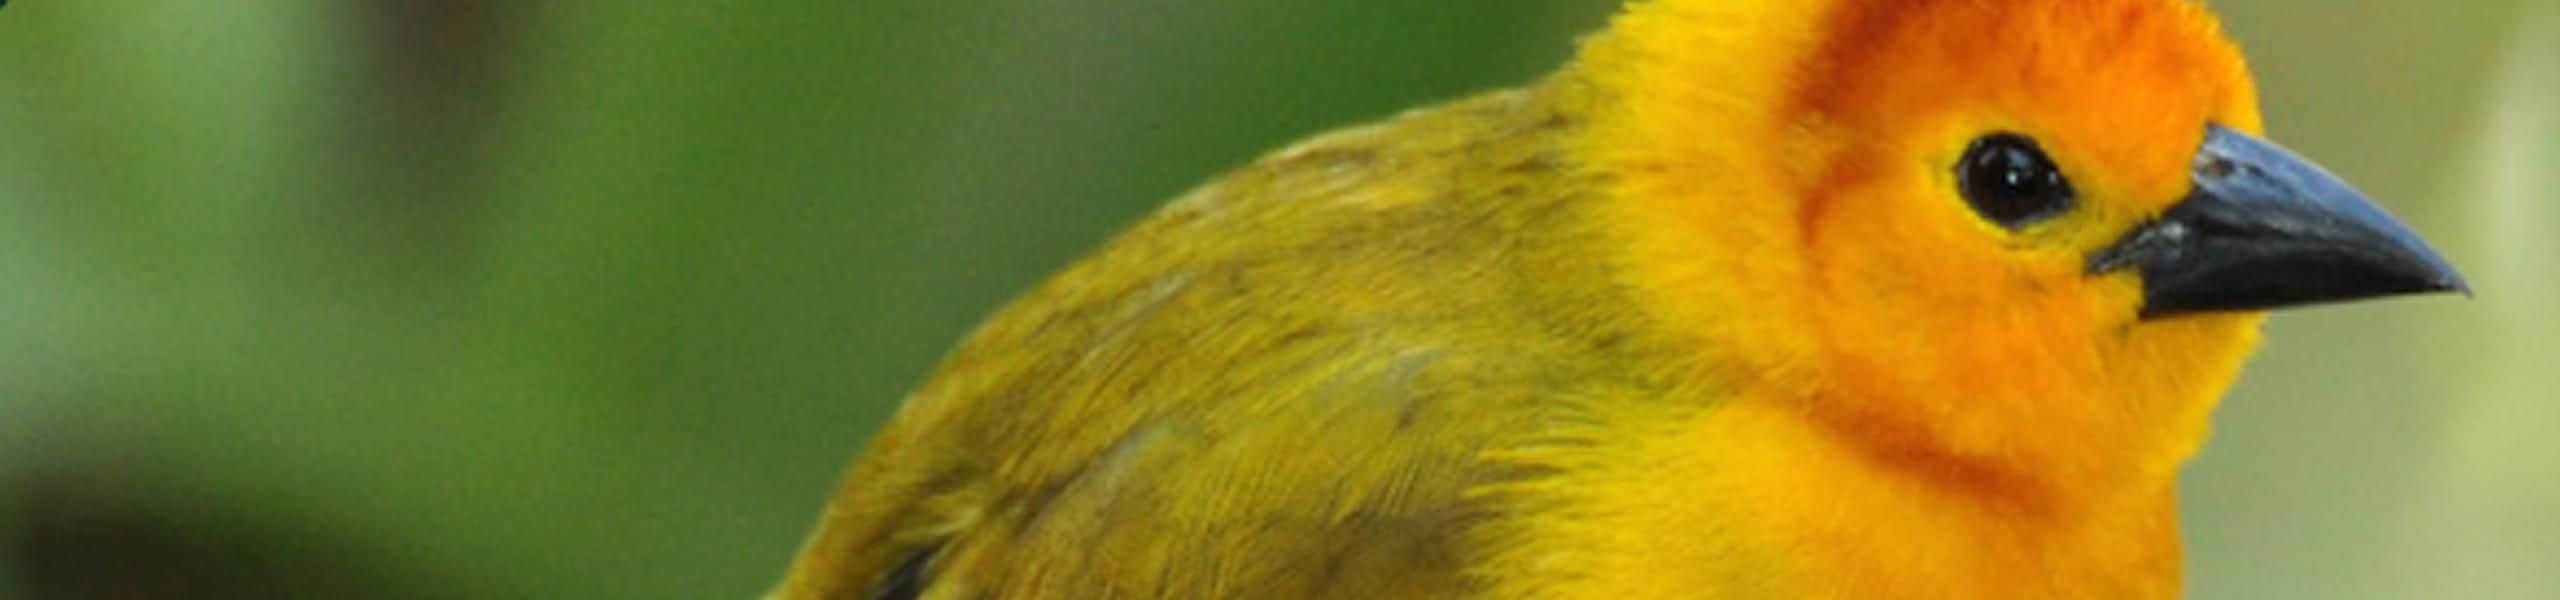 Taveta Golden Weaver